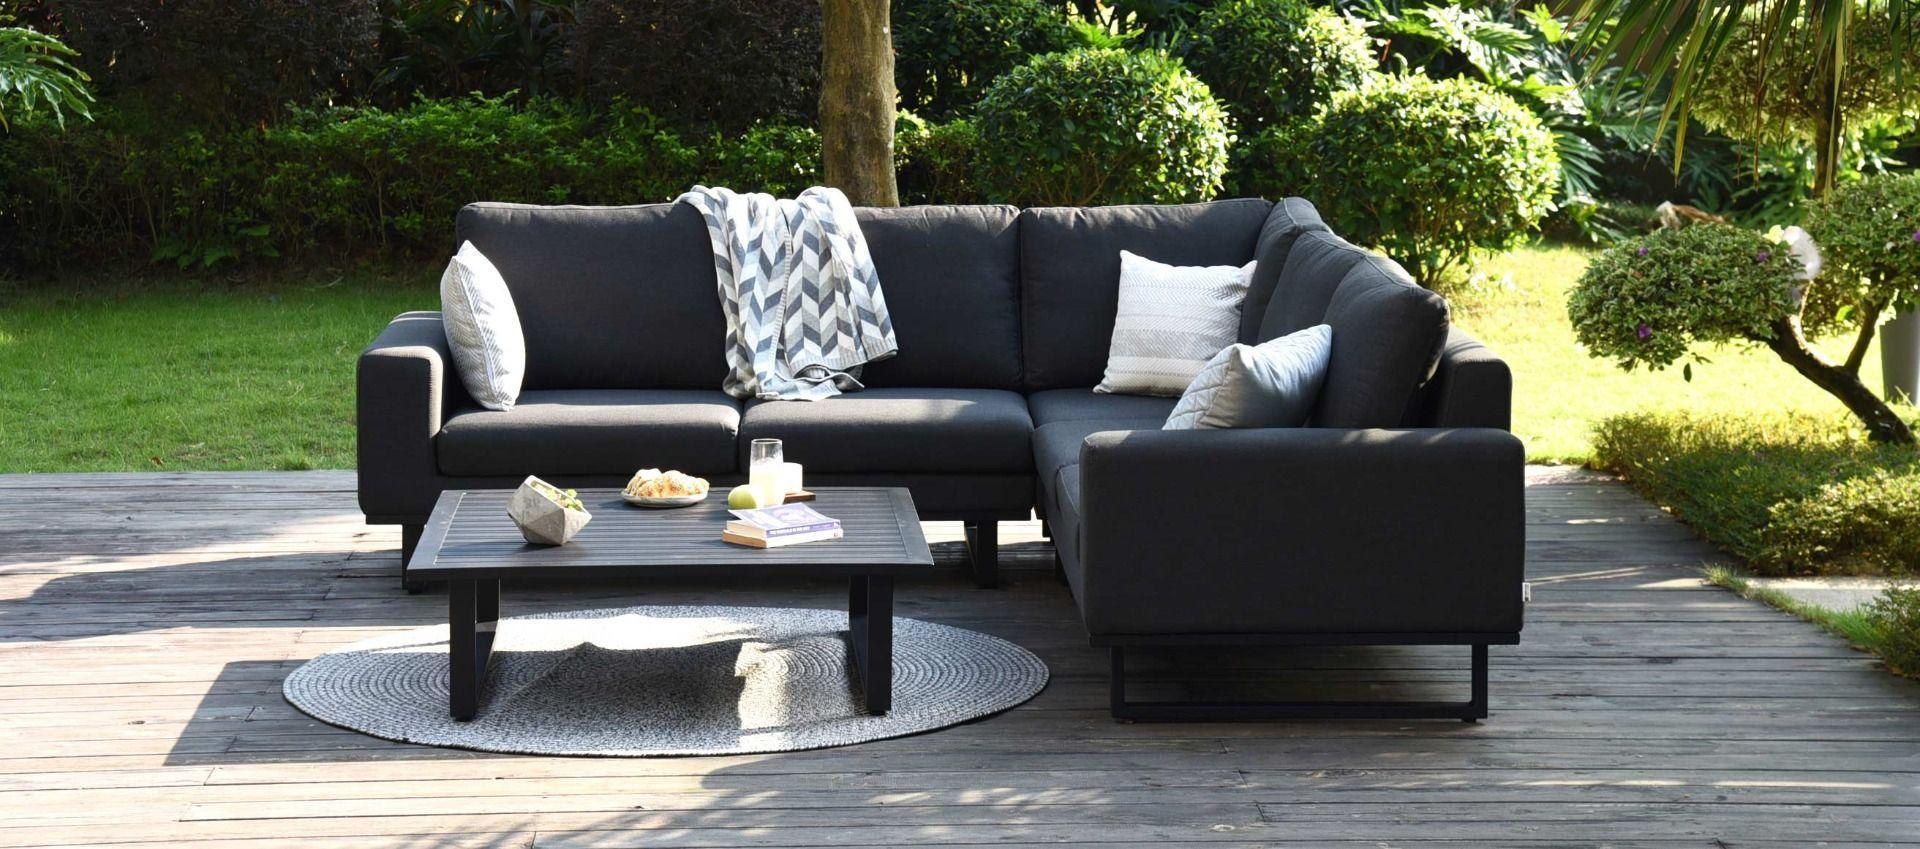 Garden Fabric Corner Sofa Group - Coffee Table - Small ...